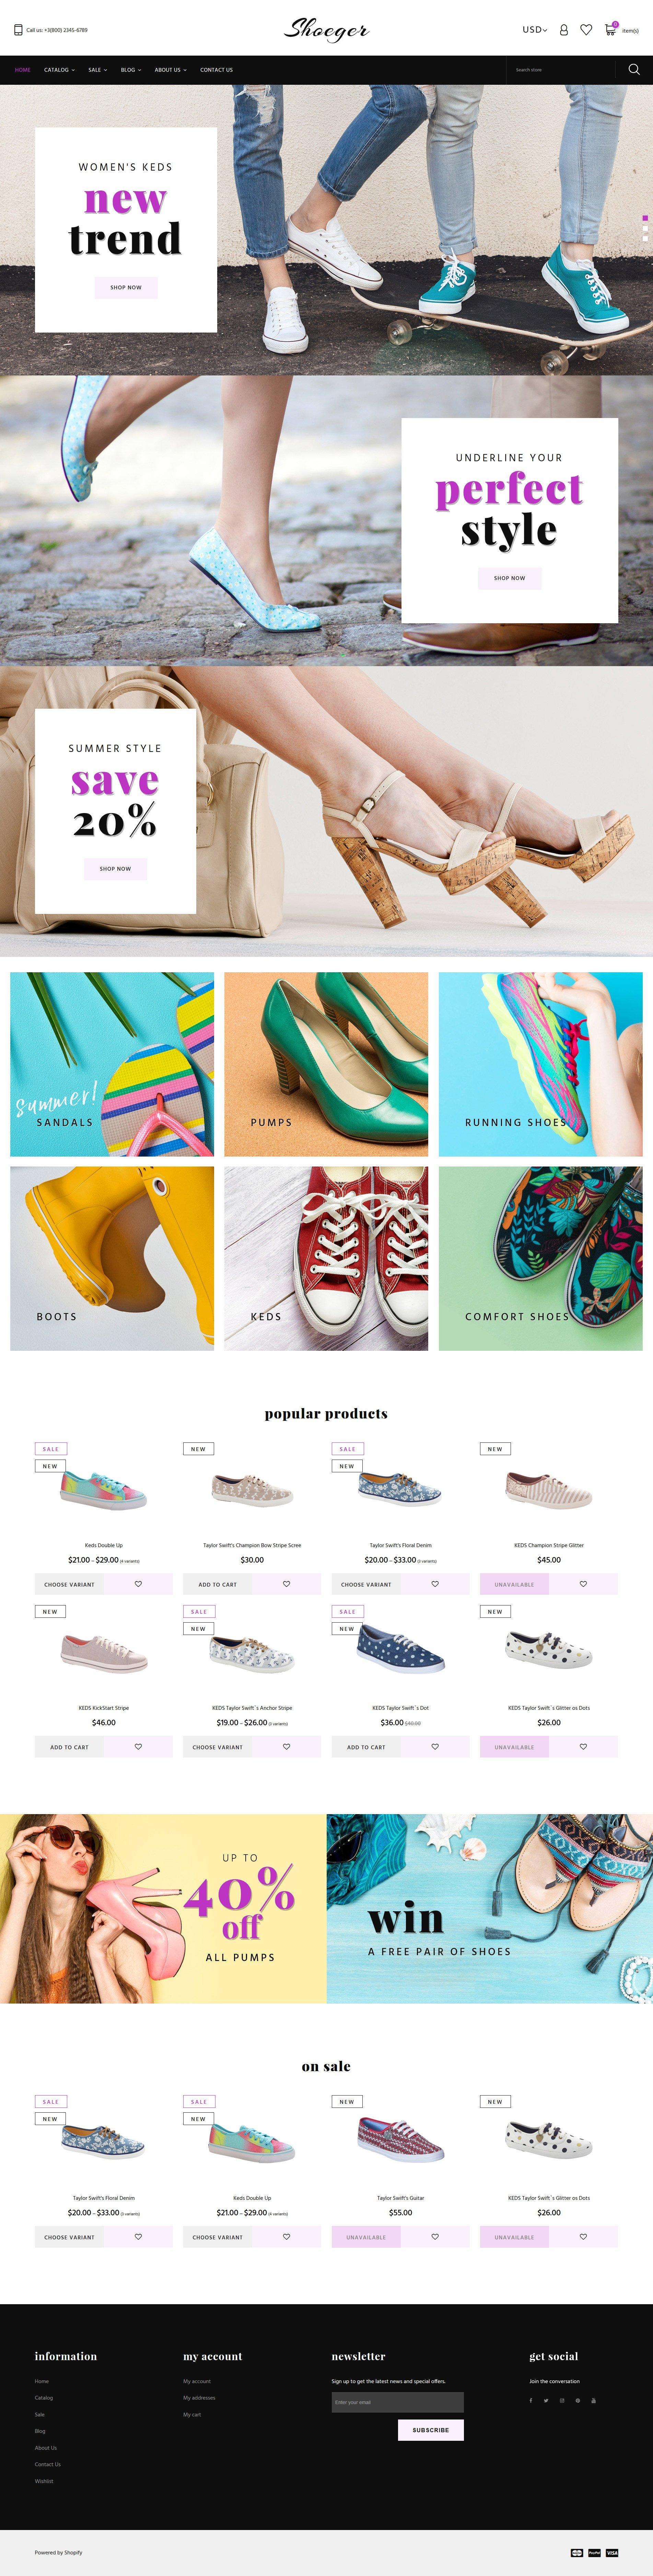 Адаптивный Shopify шаблон №64380 на тему магазин обуви